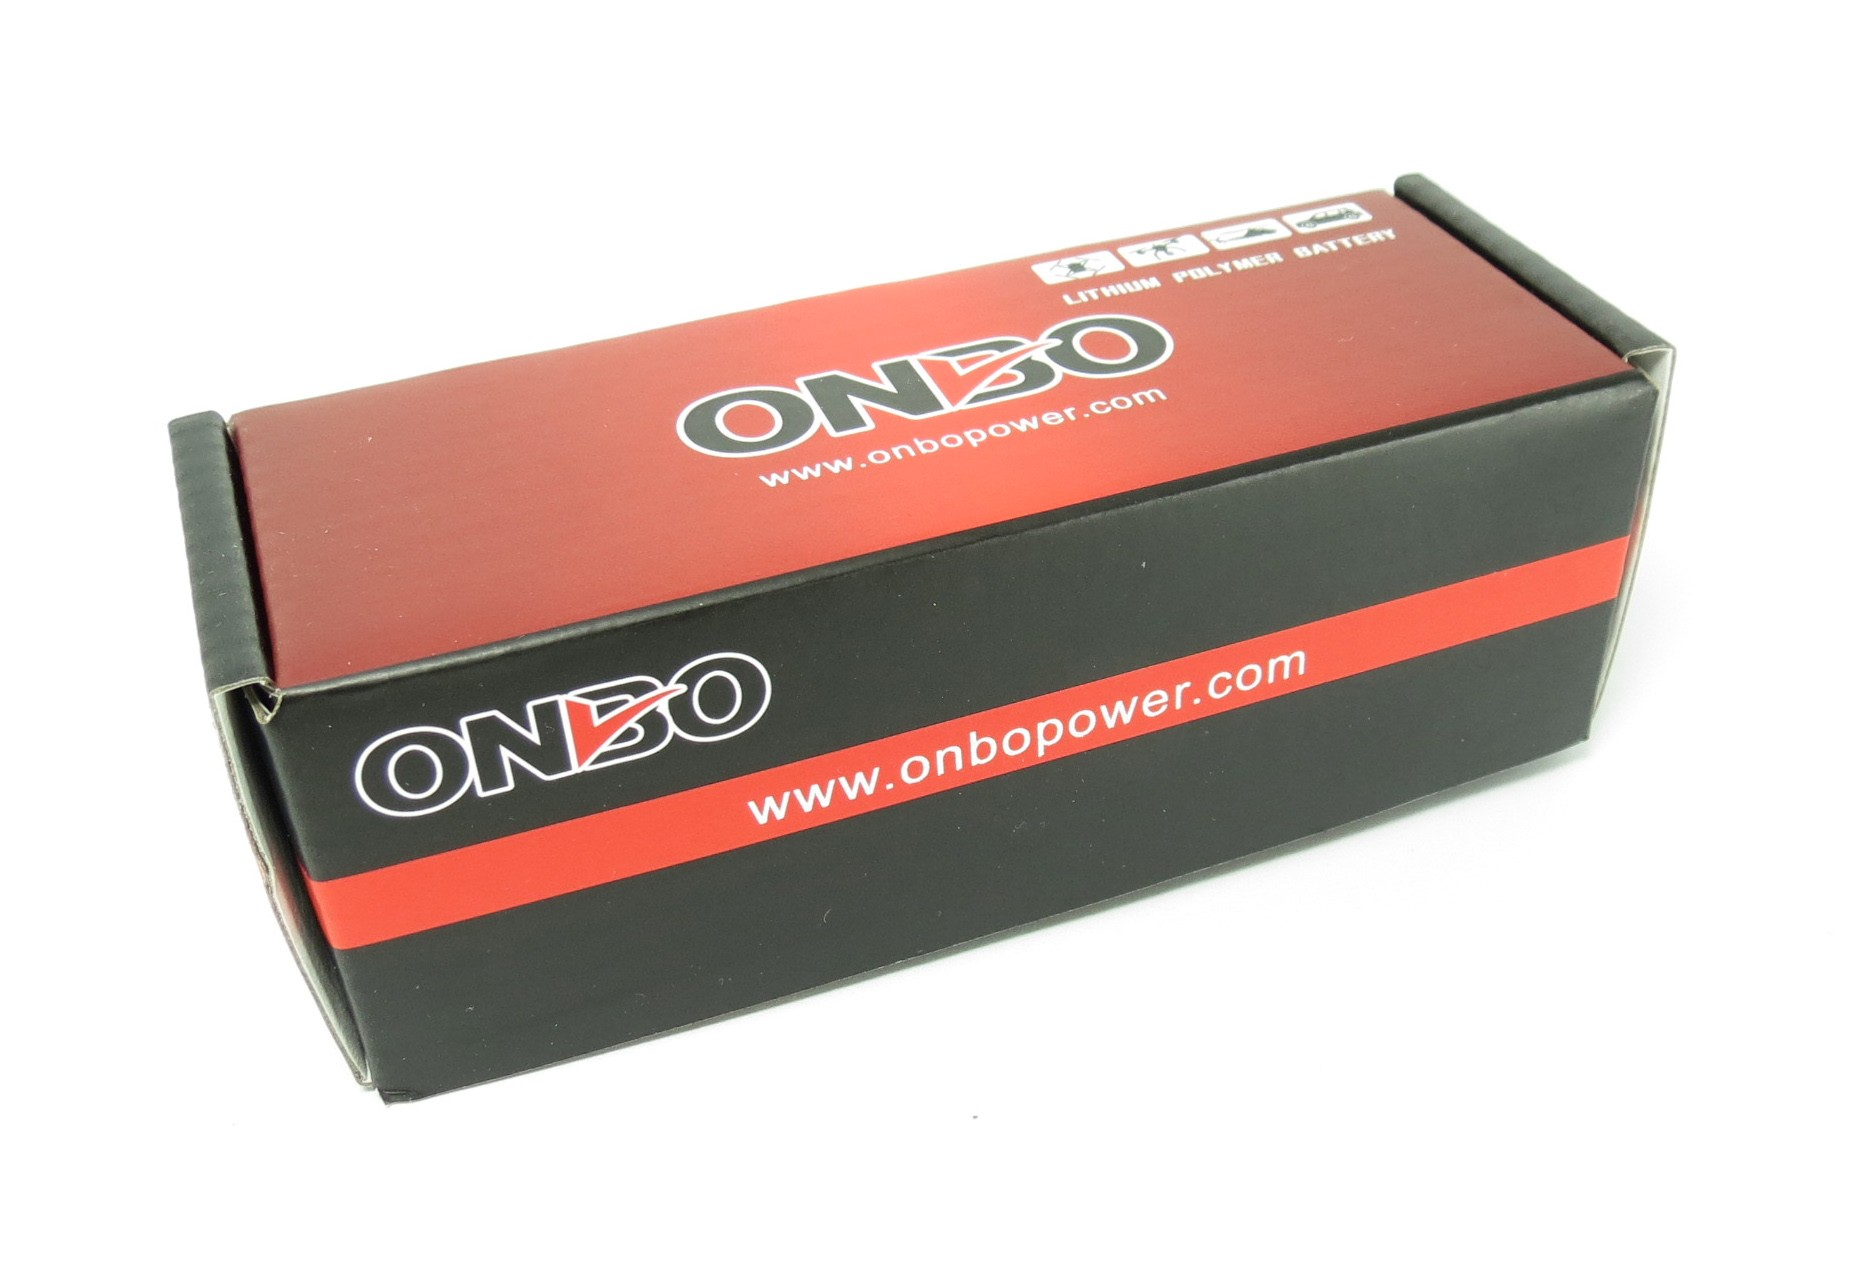 Bateria Onbo Power Life 2100mah 6.6v 25c